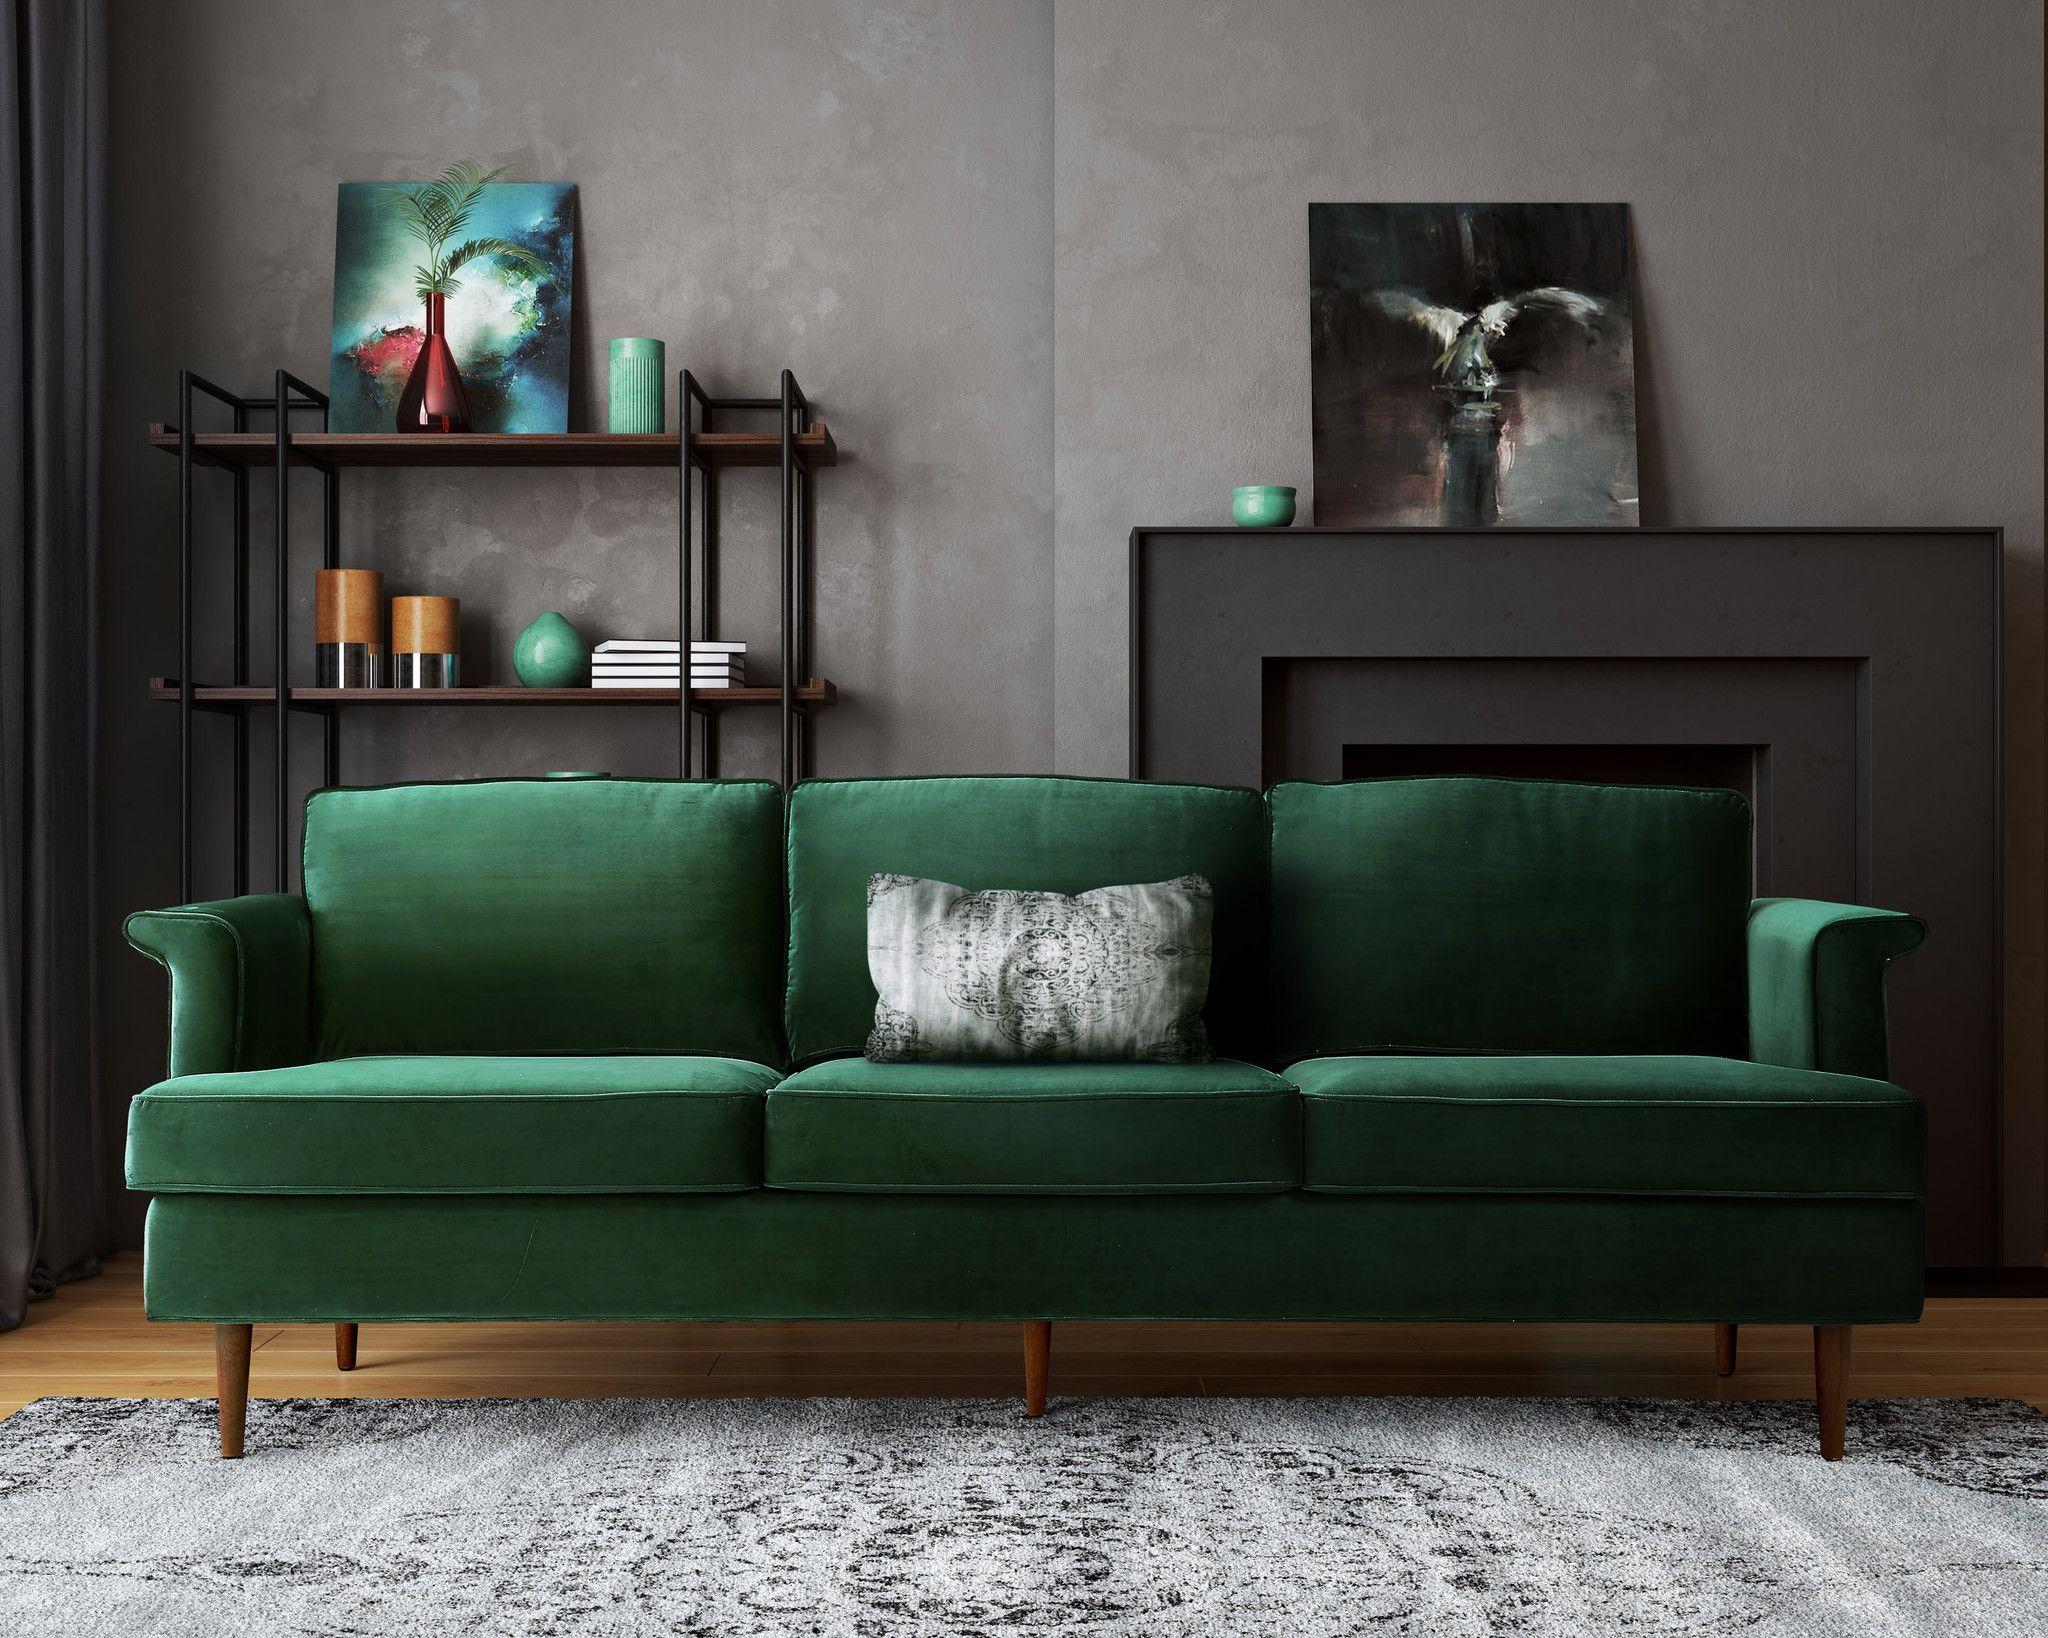 sofasandmore creative design sofa warrington porter forest green foam cushions mid century